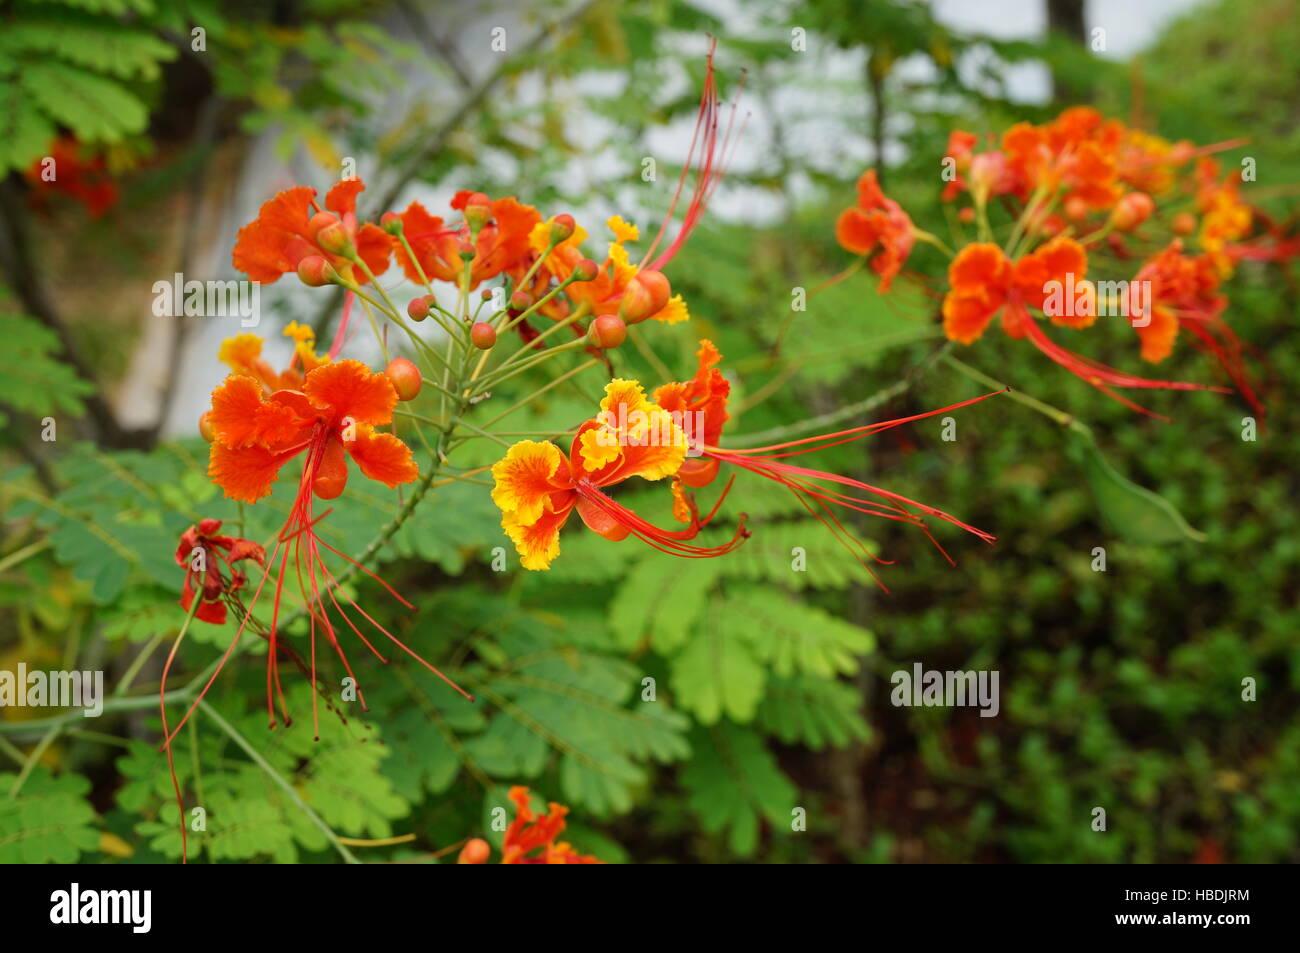 Orange And Yellow Caesalpinia Pulcherrima Flowers A Tropical Plant